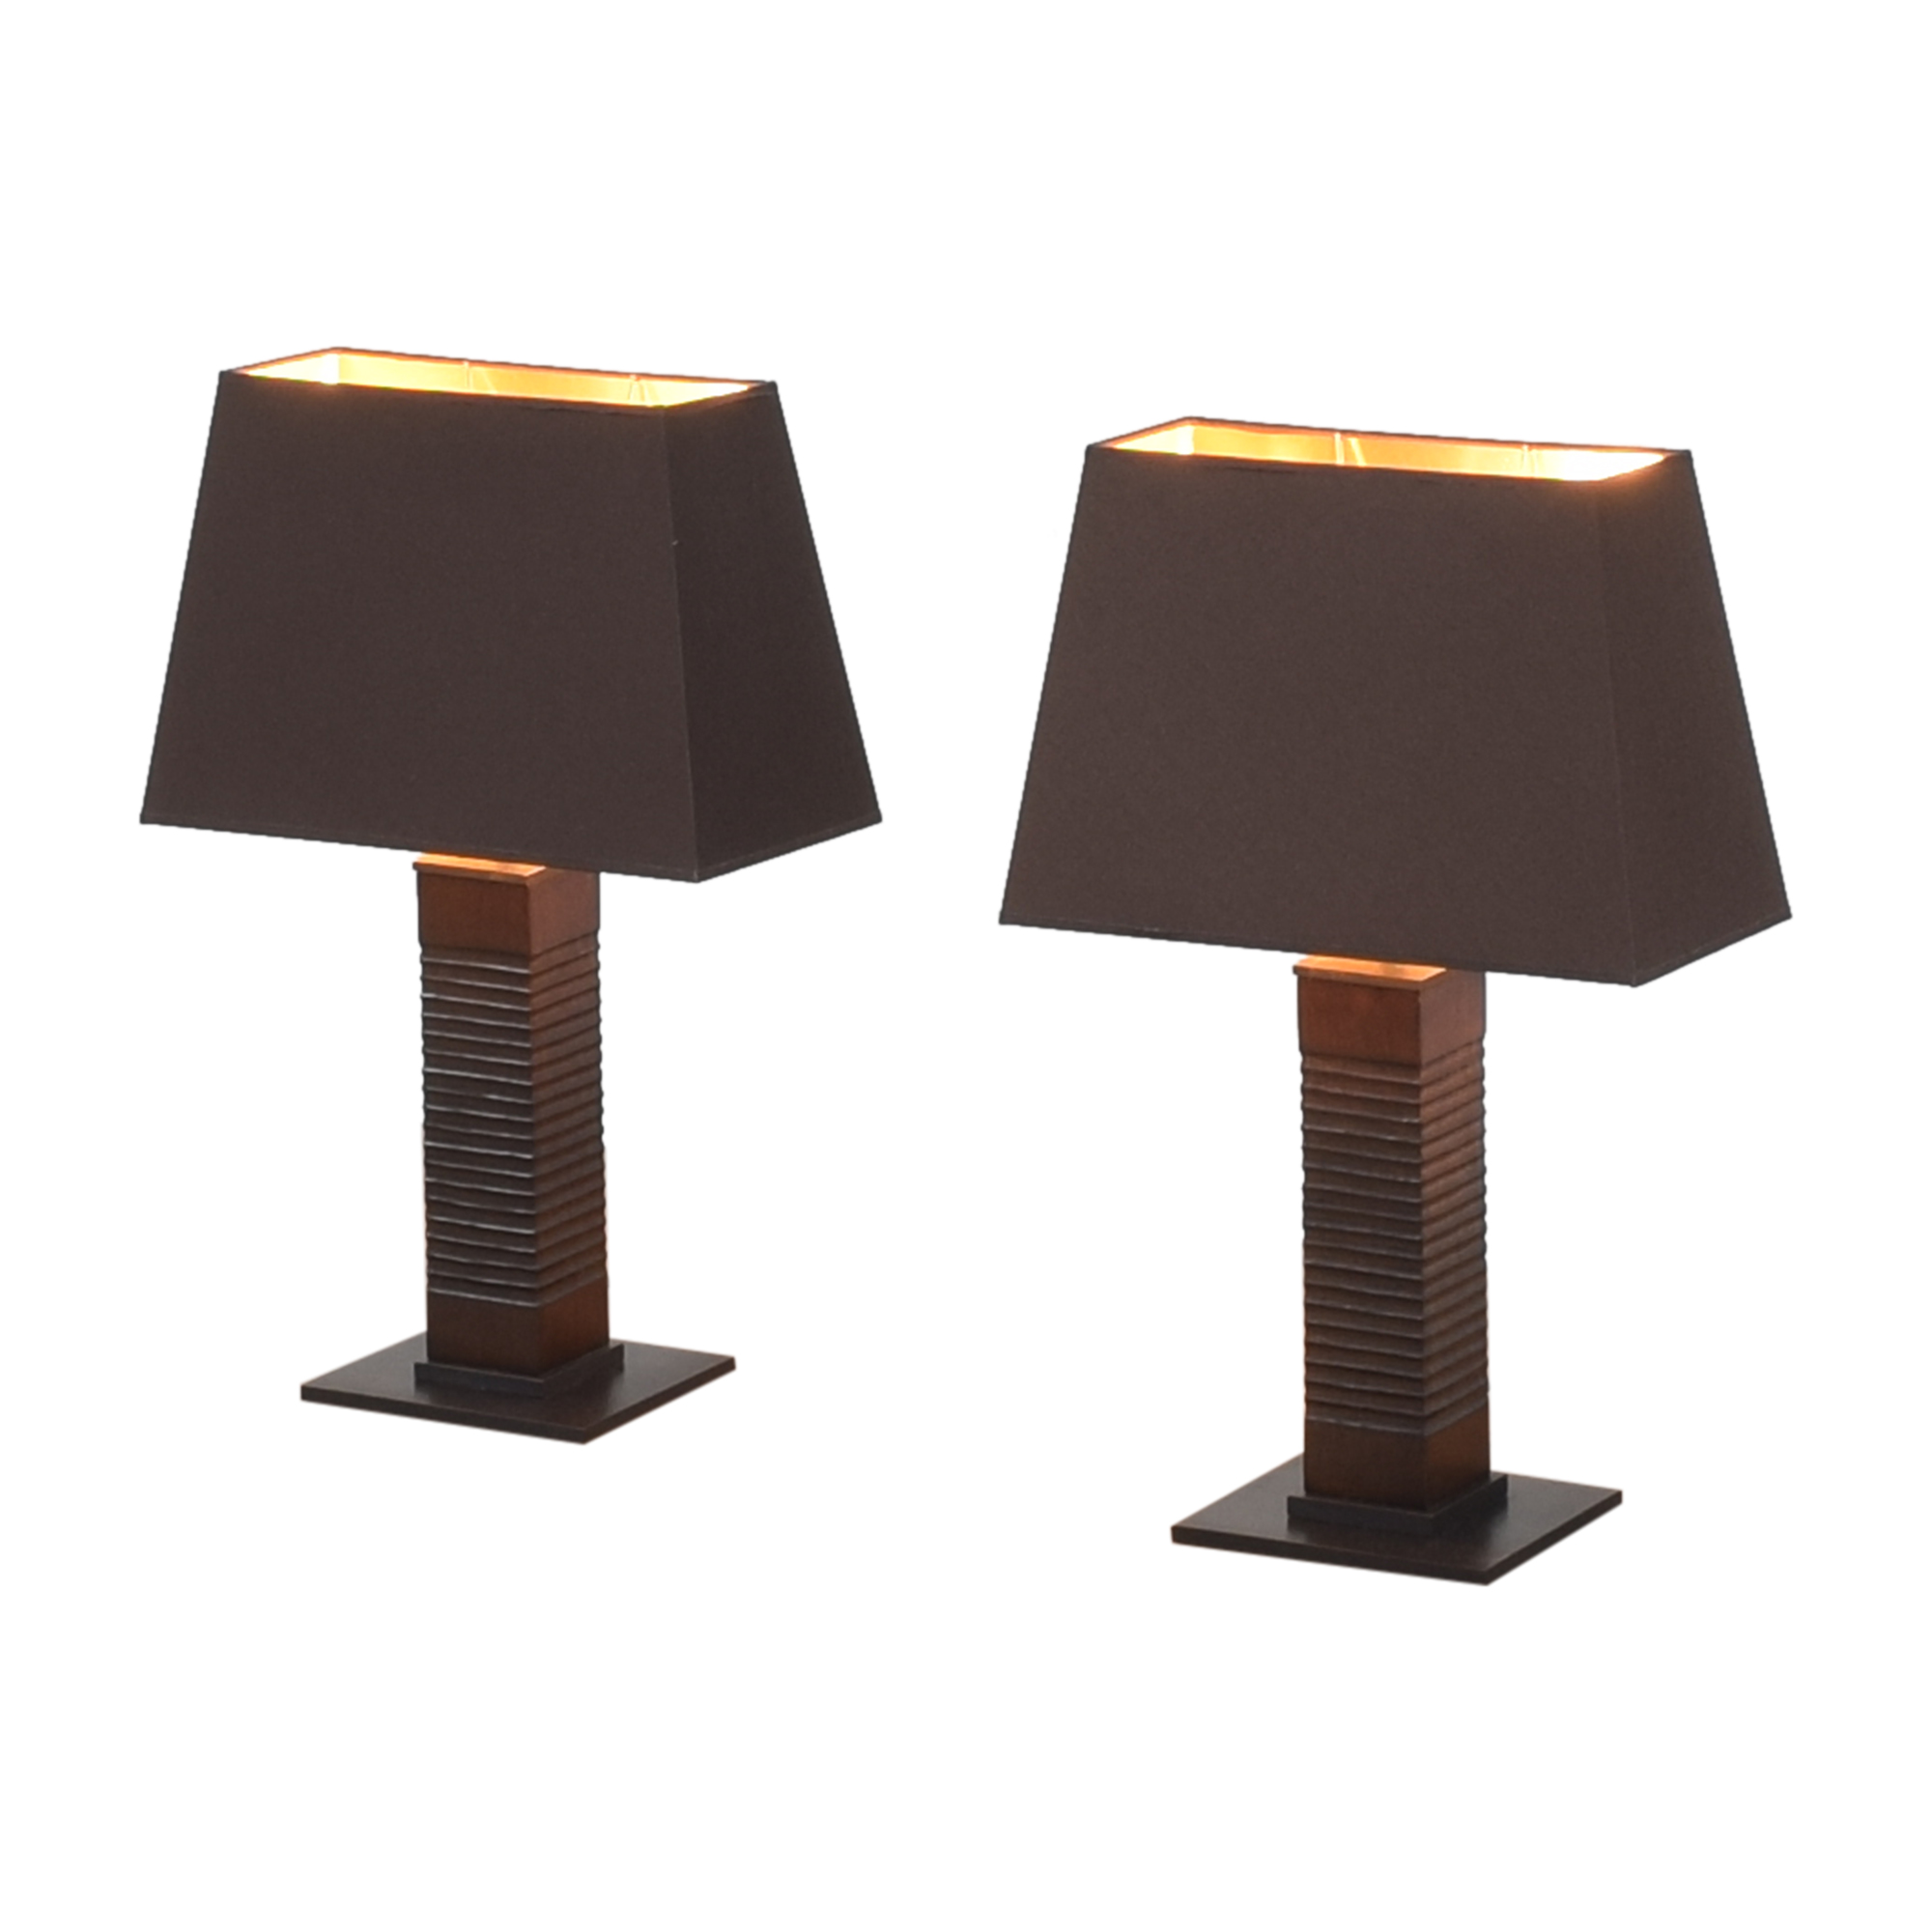 Usona Usona Table Lamps